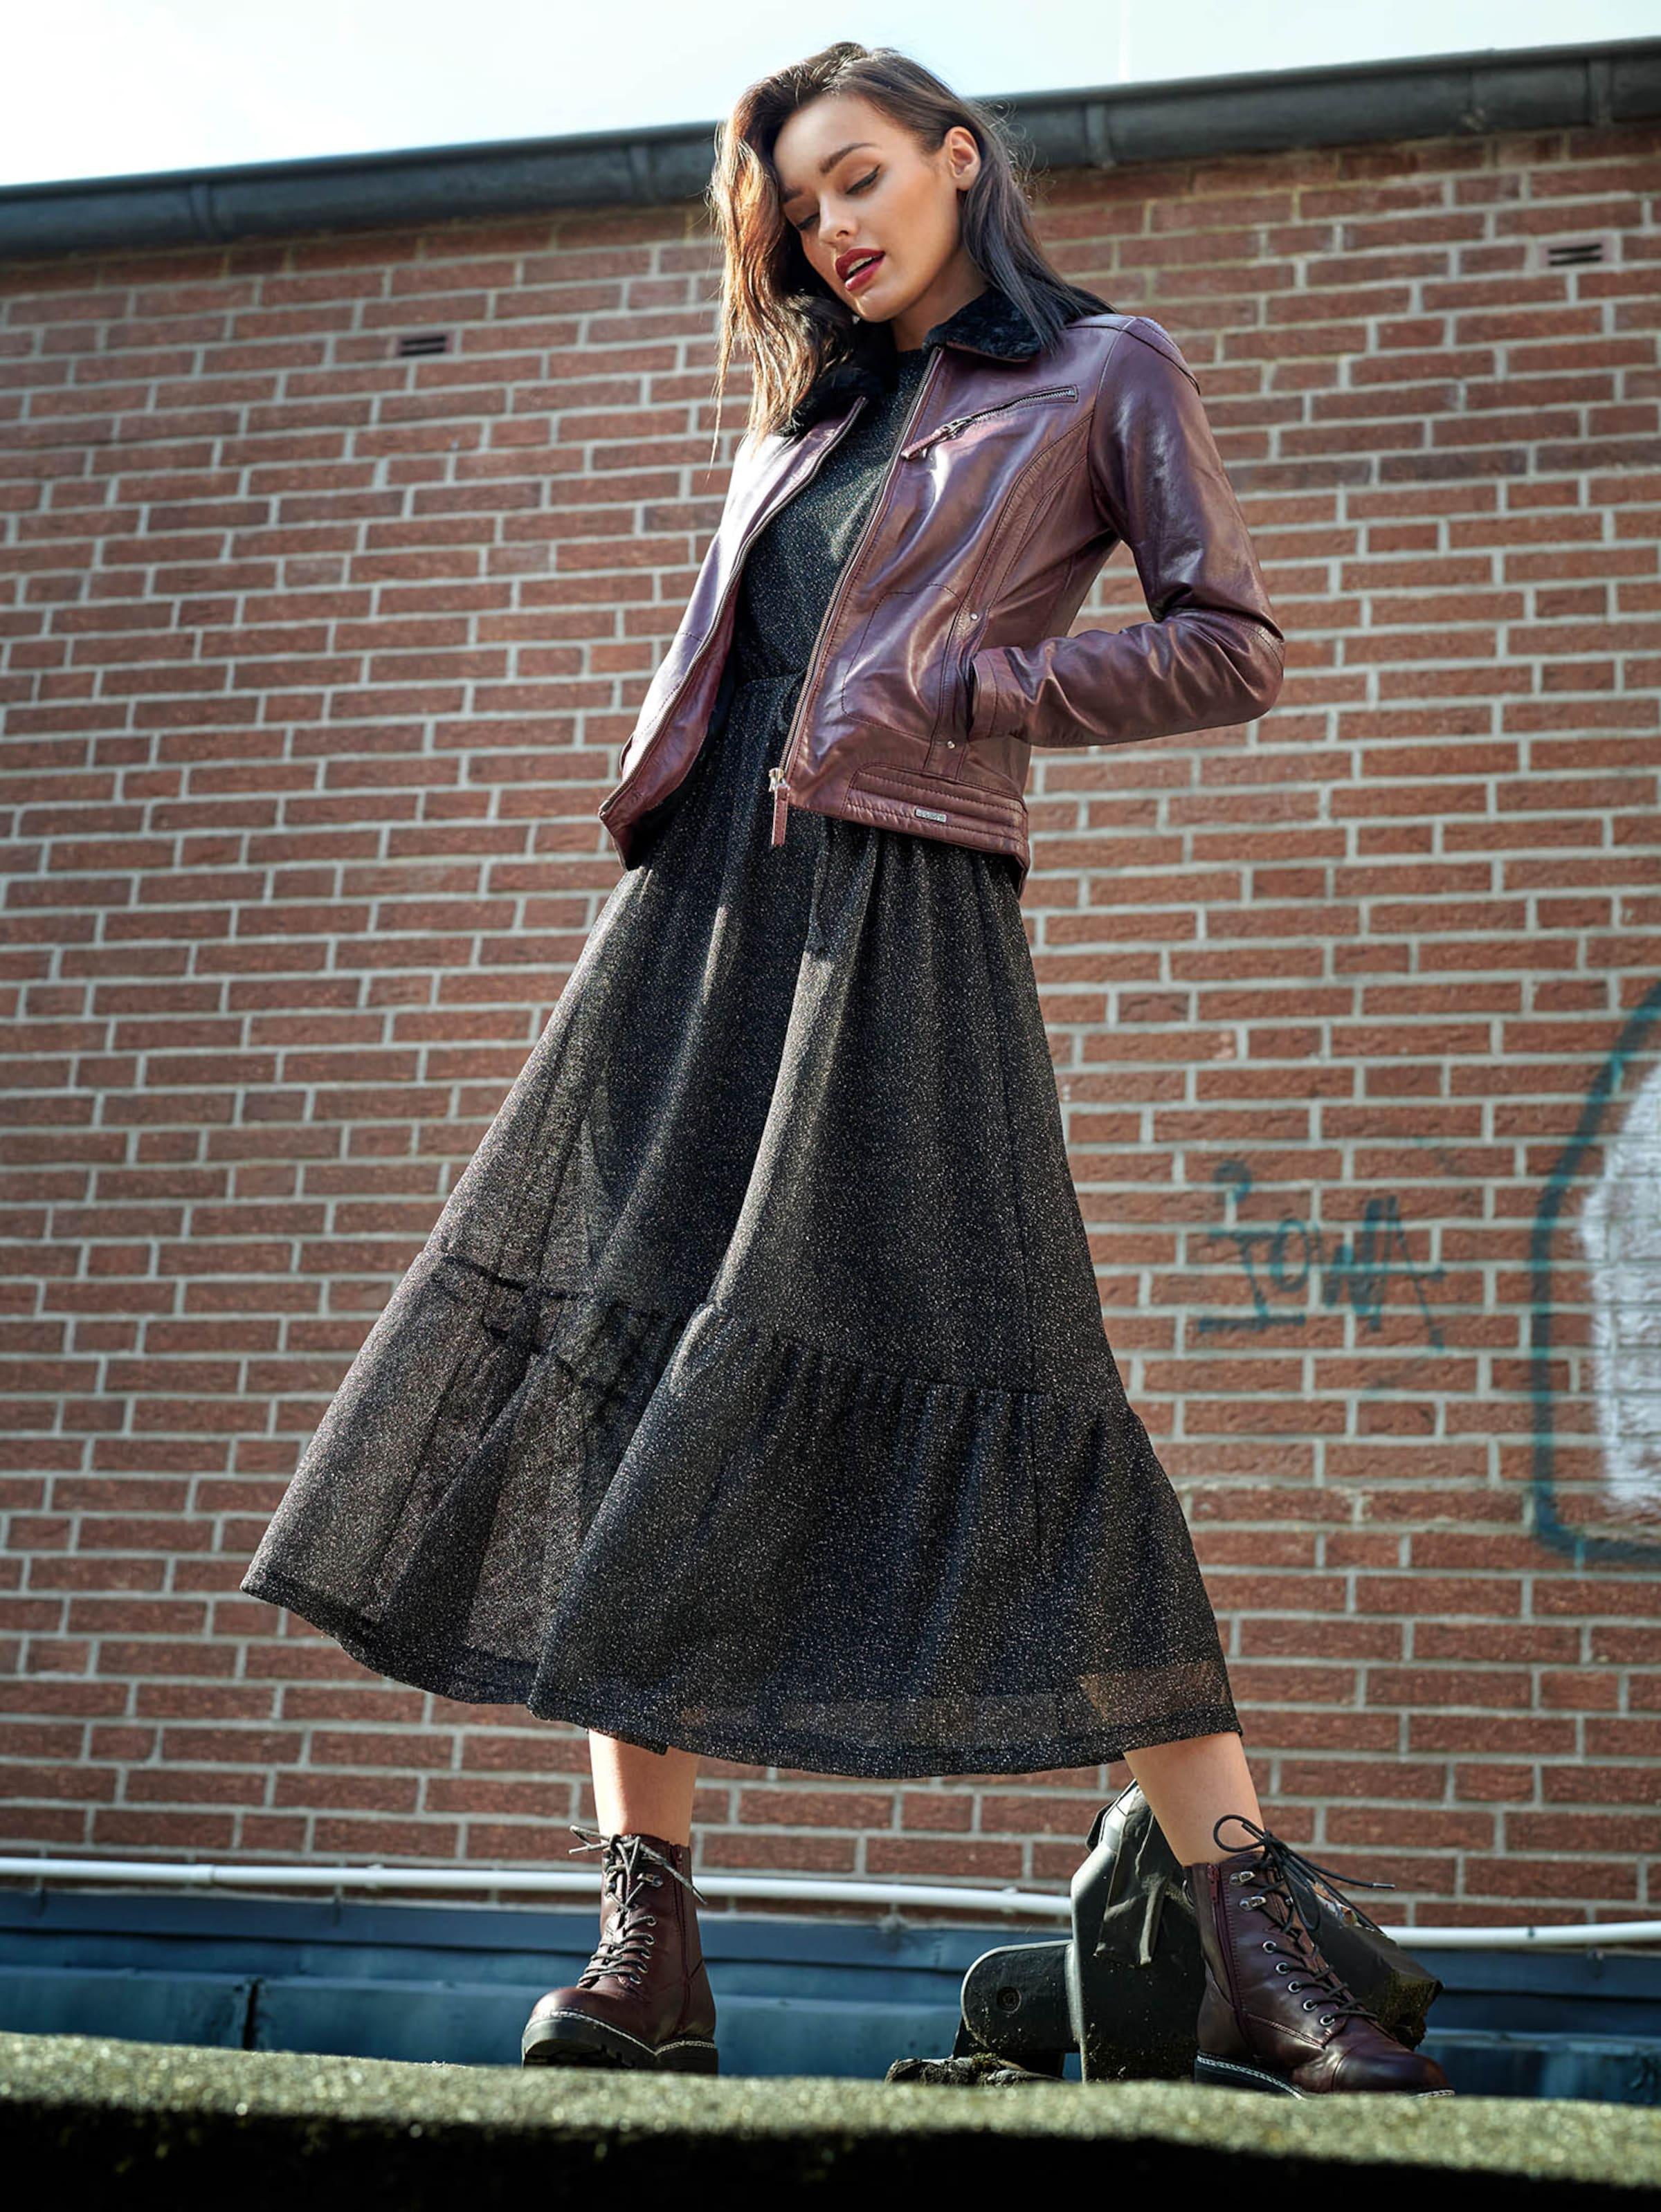 Hochwertige Outfits Online Kaufen About You